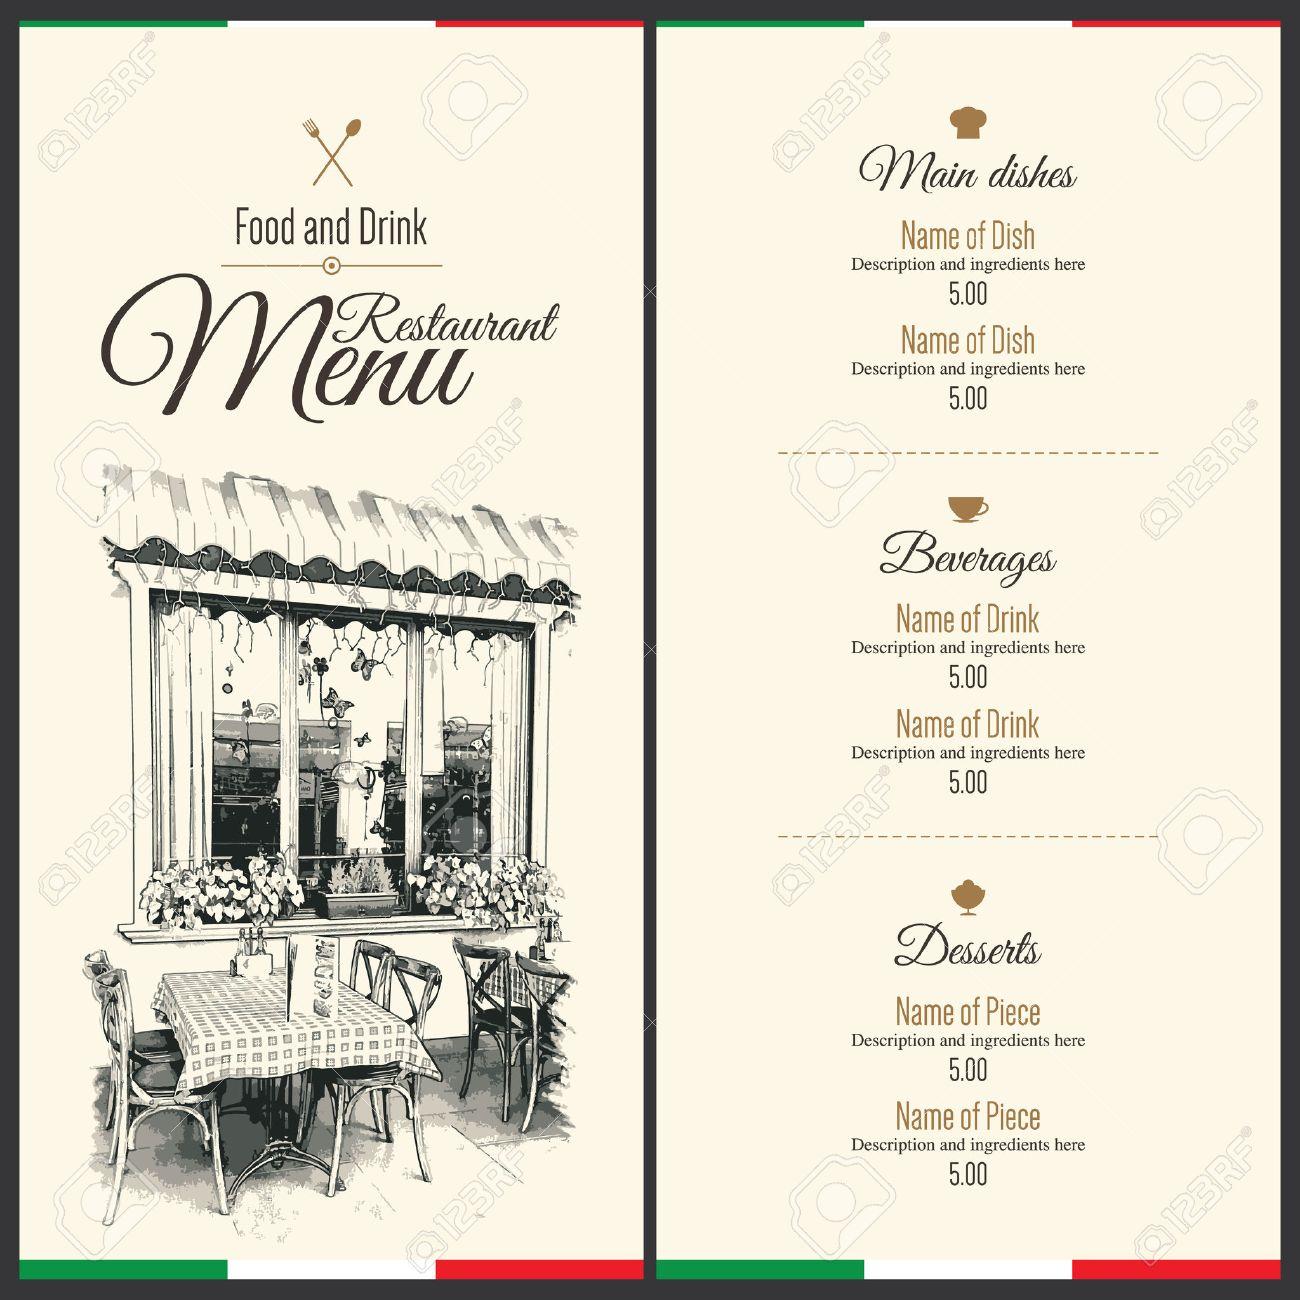 Retro restaurant menu design. With a sketch pictures - 43961375